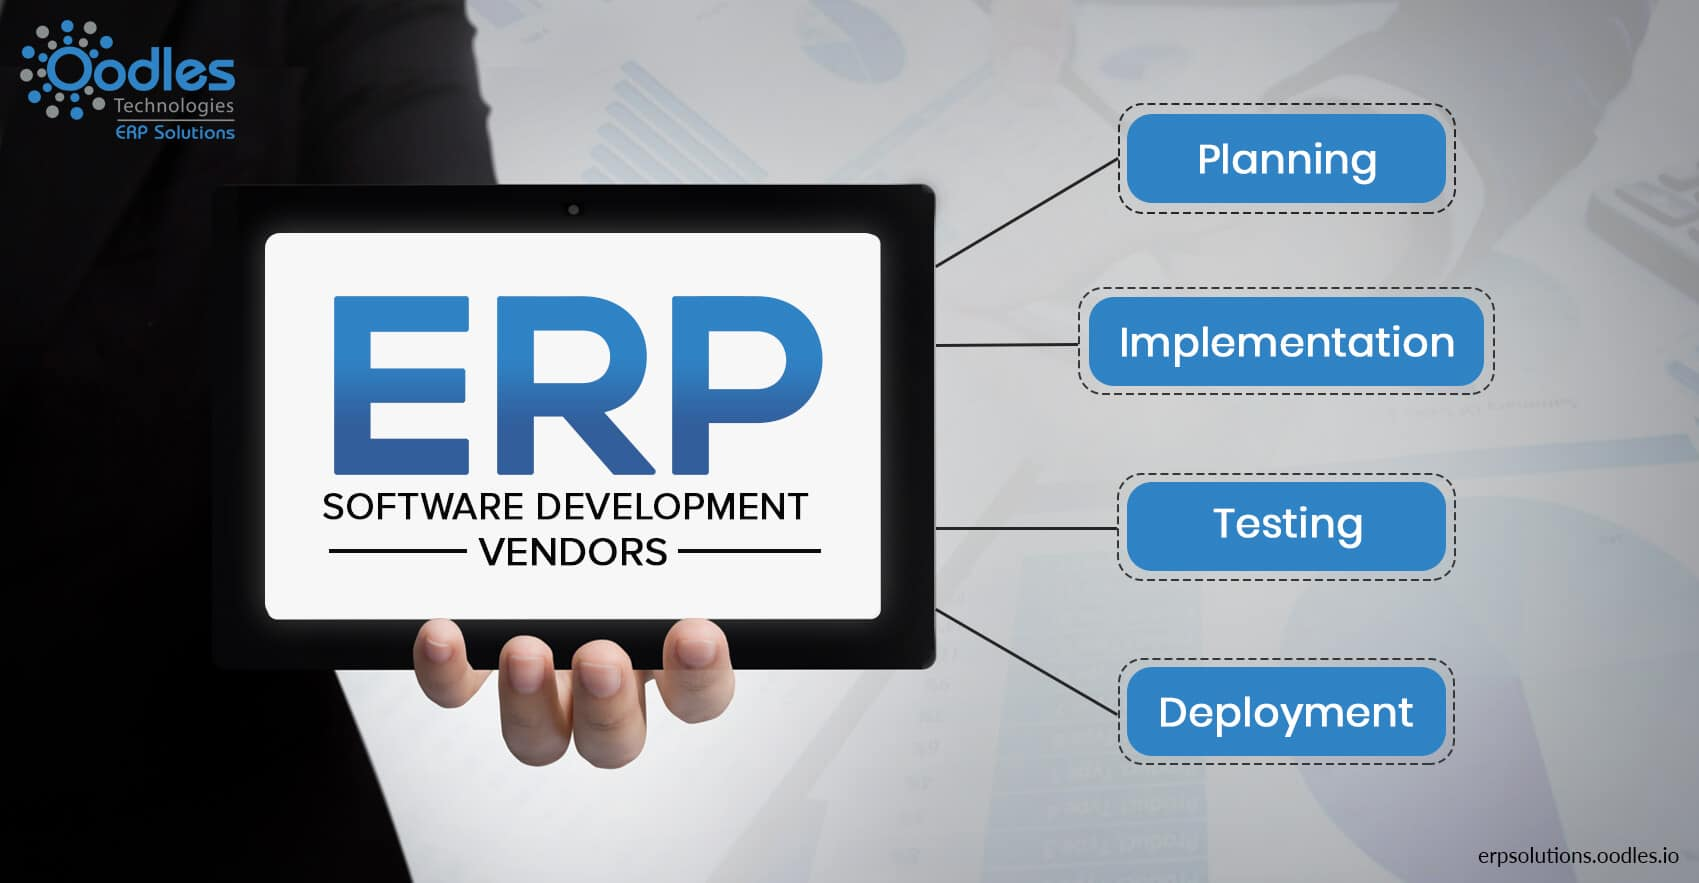 ERP software development vendors